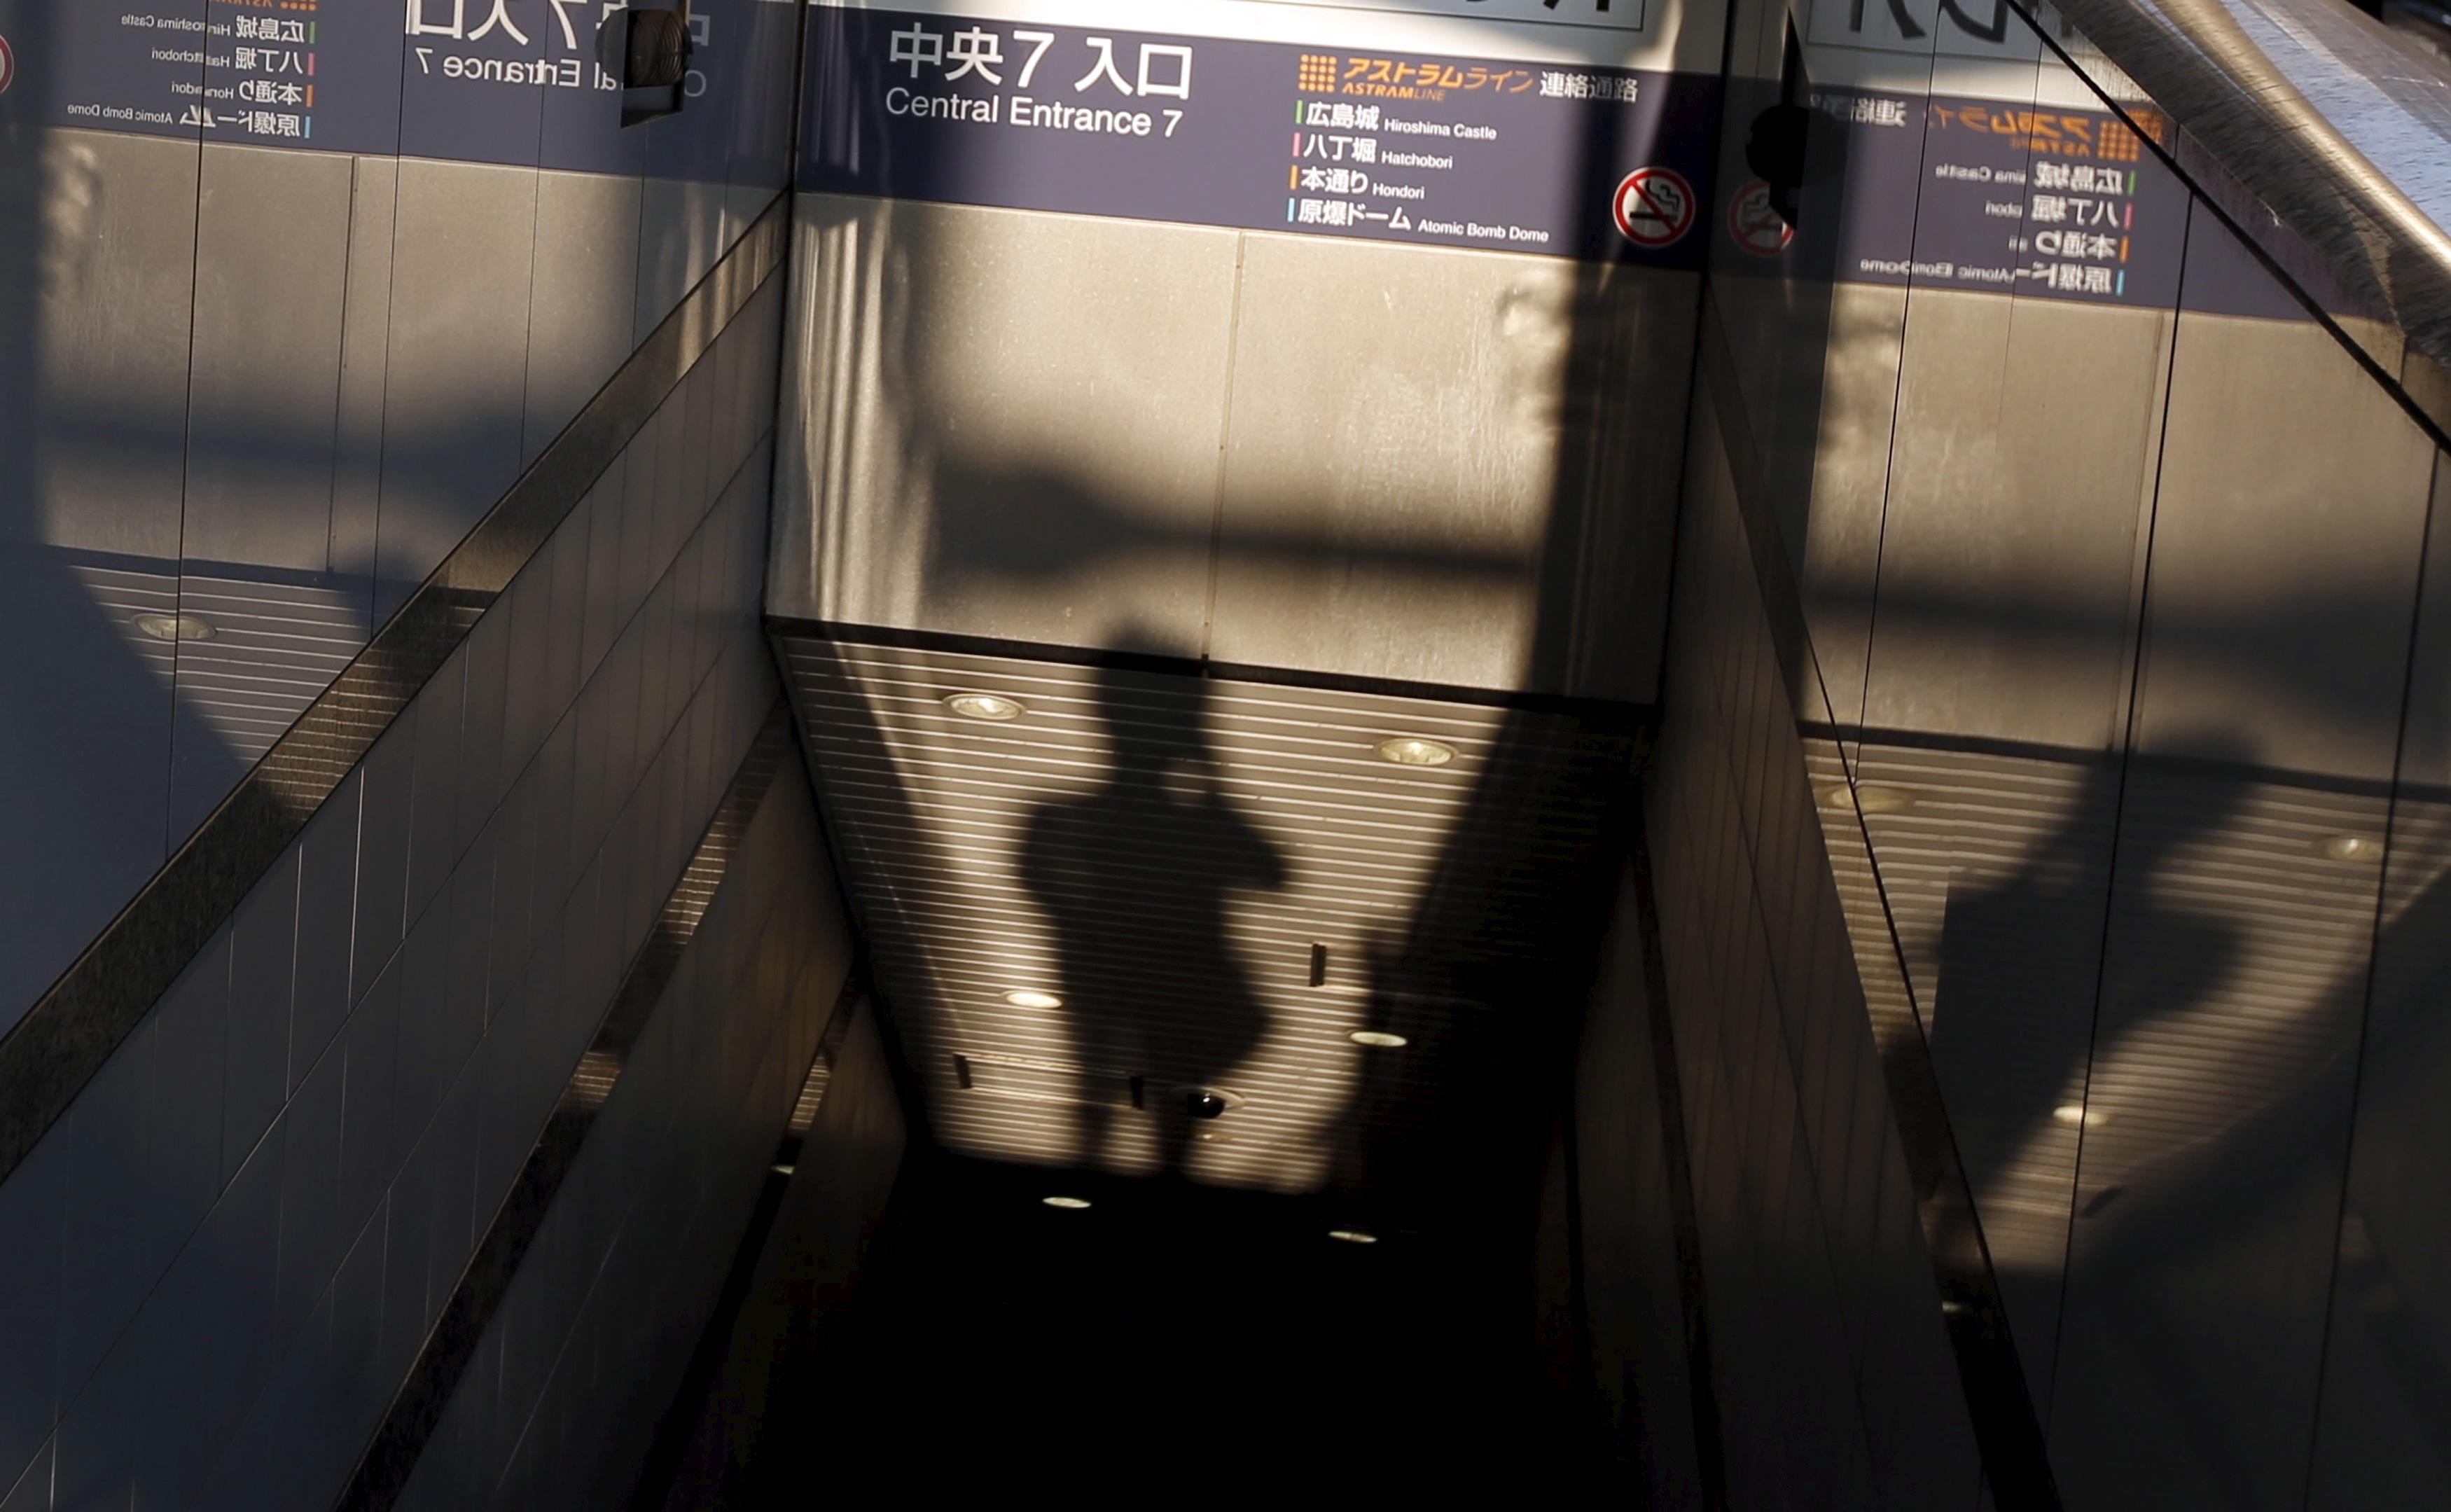 Un fotógrafo a la entrada de un centro comercial subterráneo en Hiroshima. REUTERS